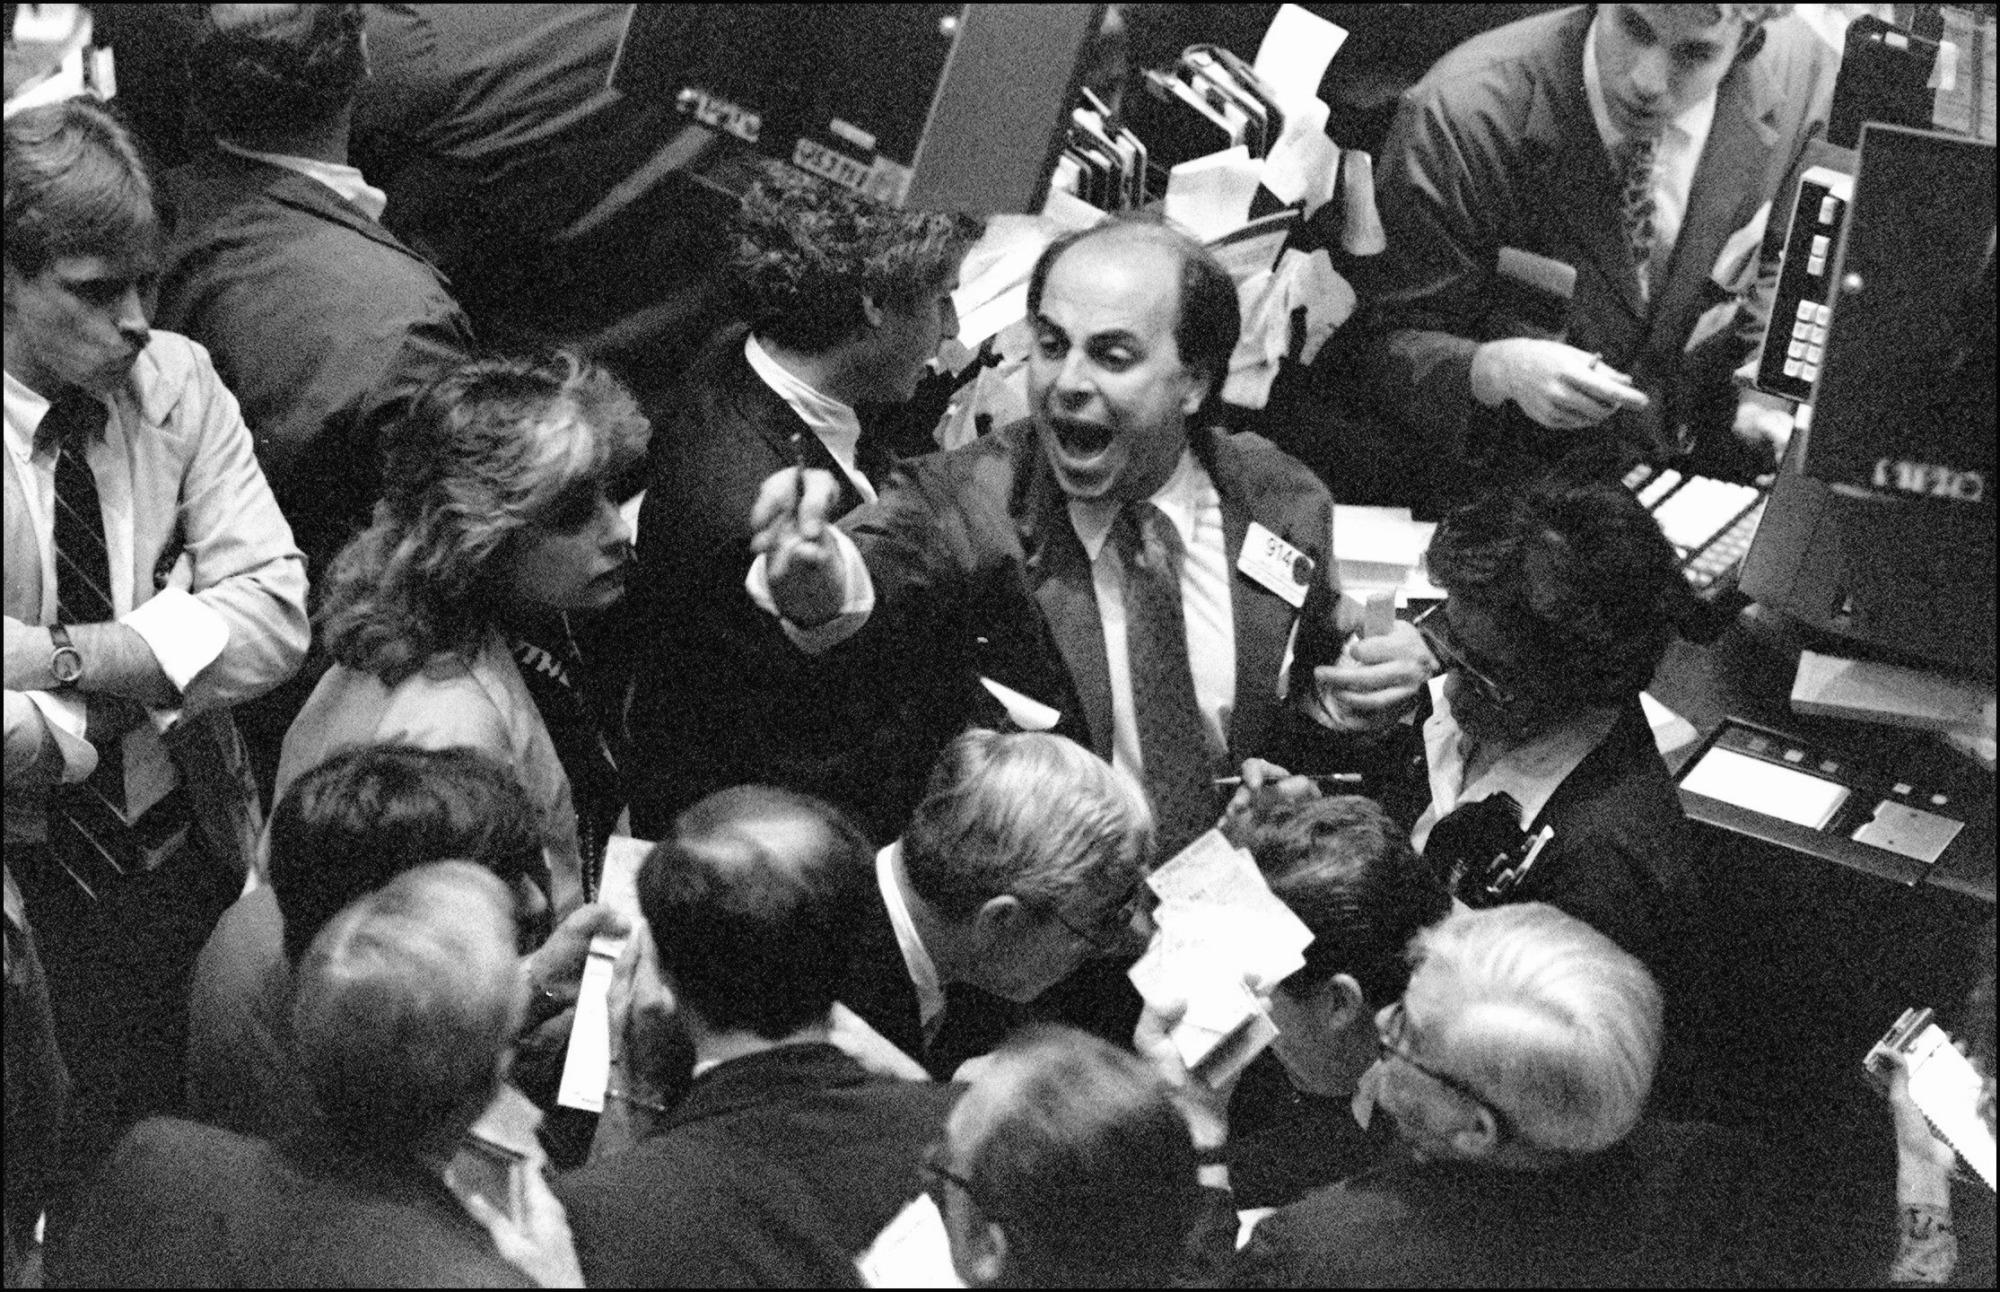 Stock Market Crash,1929,New York Stock Exchange,Crowd Gathered,Big Board,NYSE